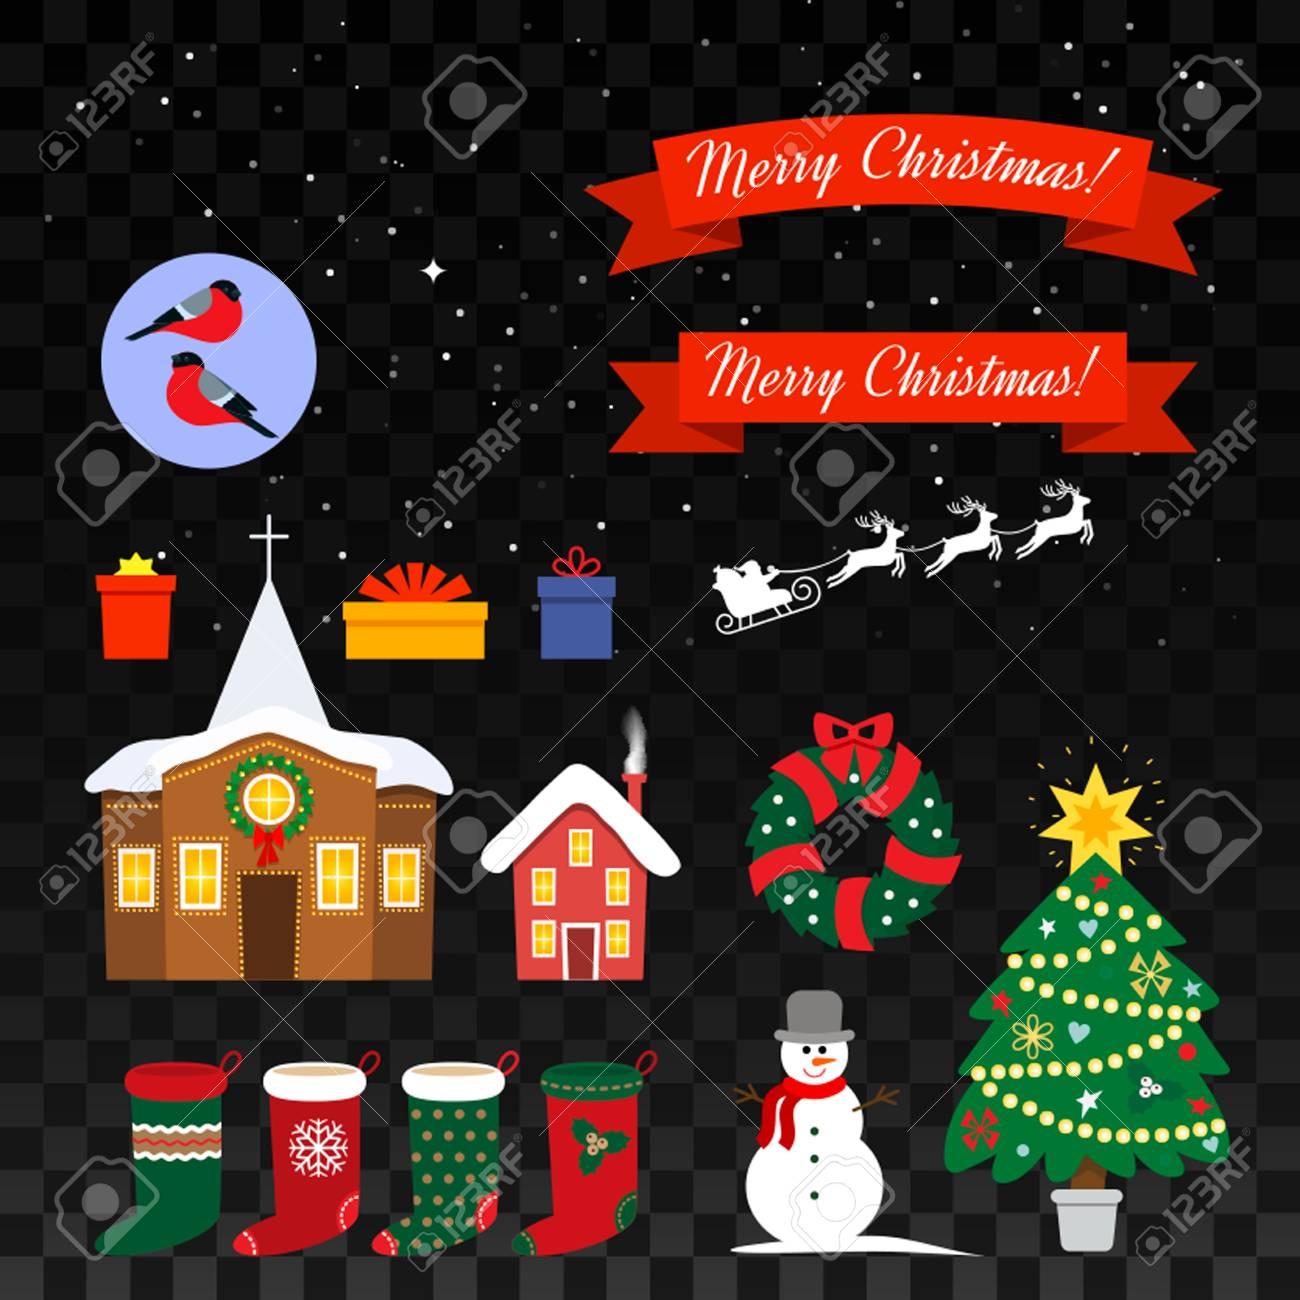 Big Set Of Christmas Symbols For Web Design And Greeting Cards